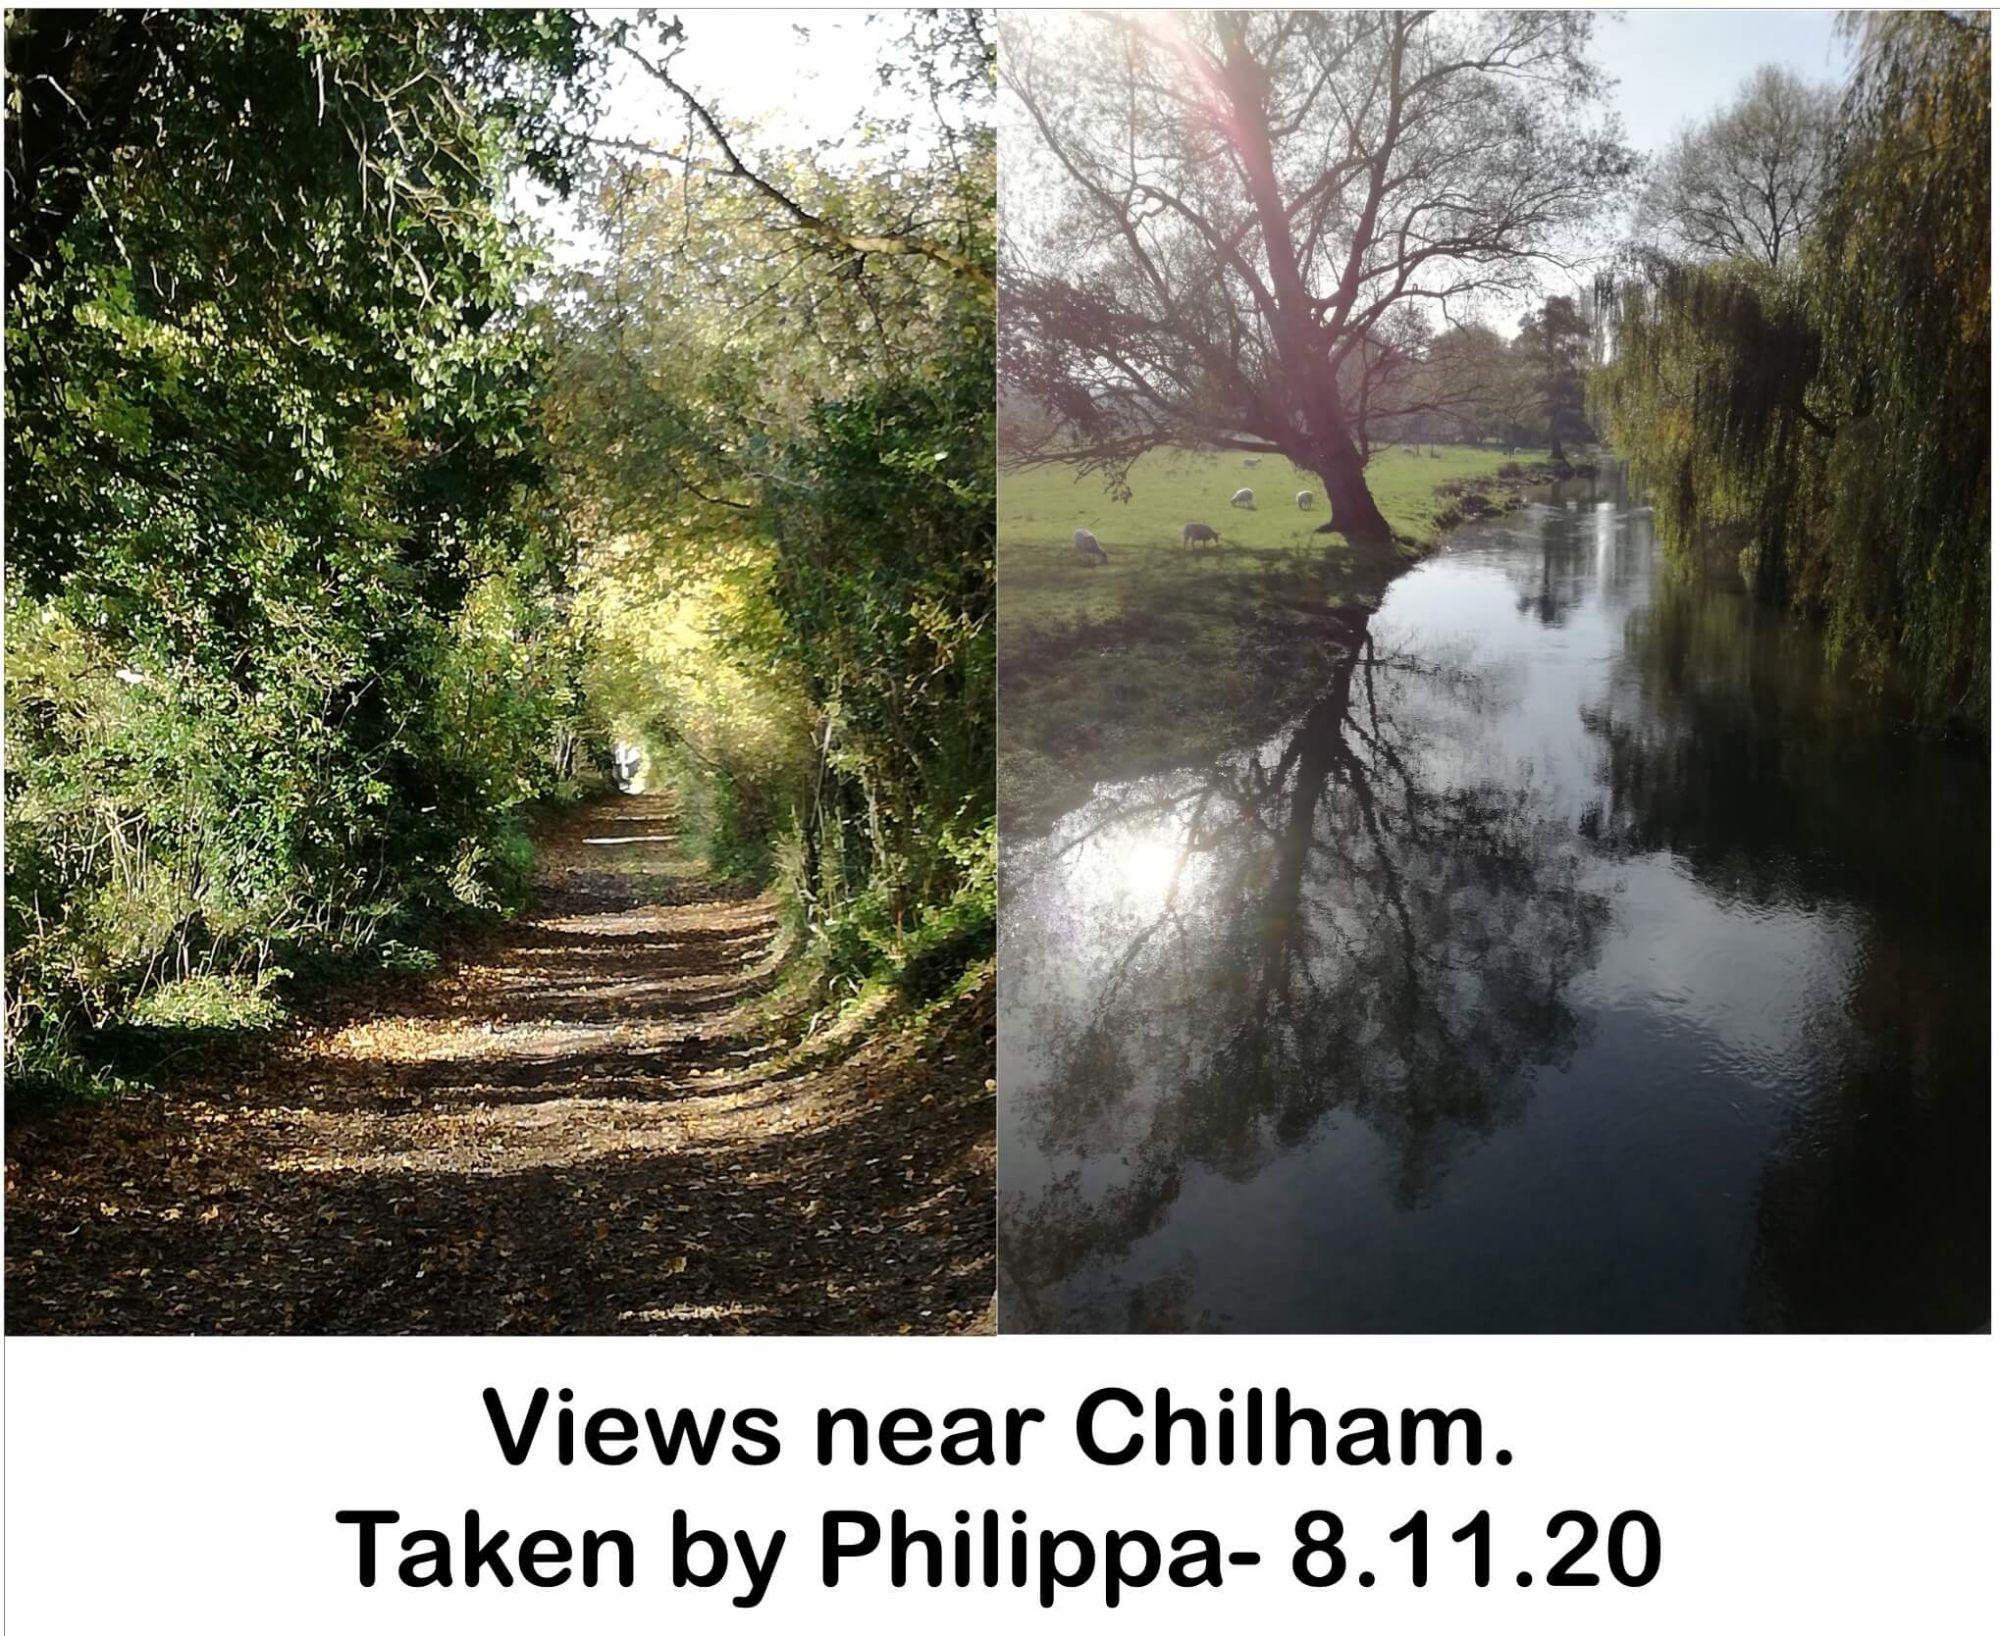 Views near Chilham.